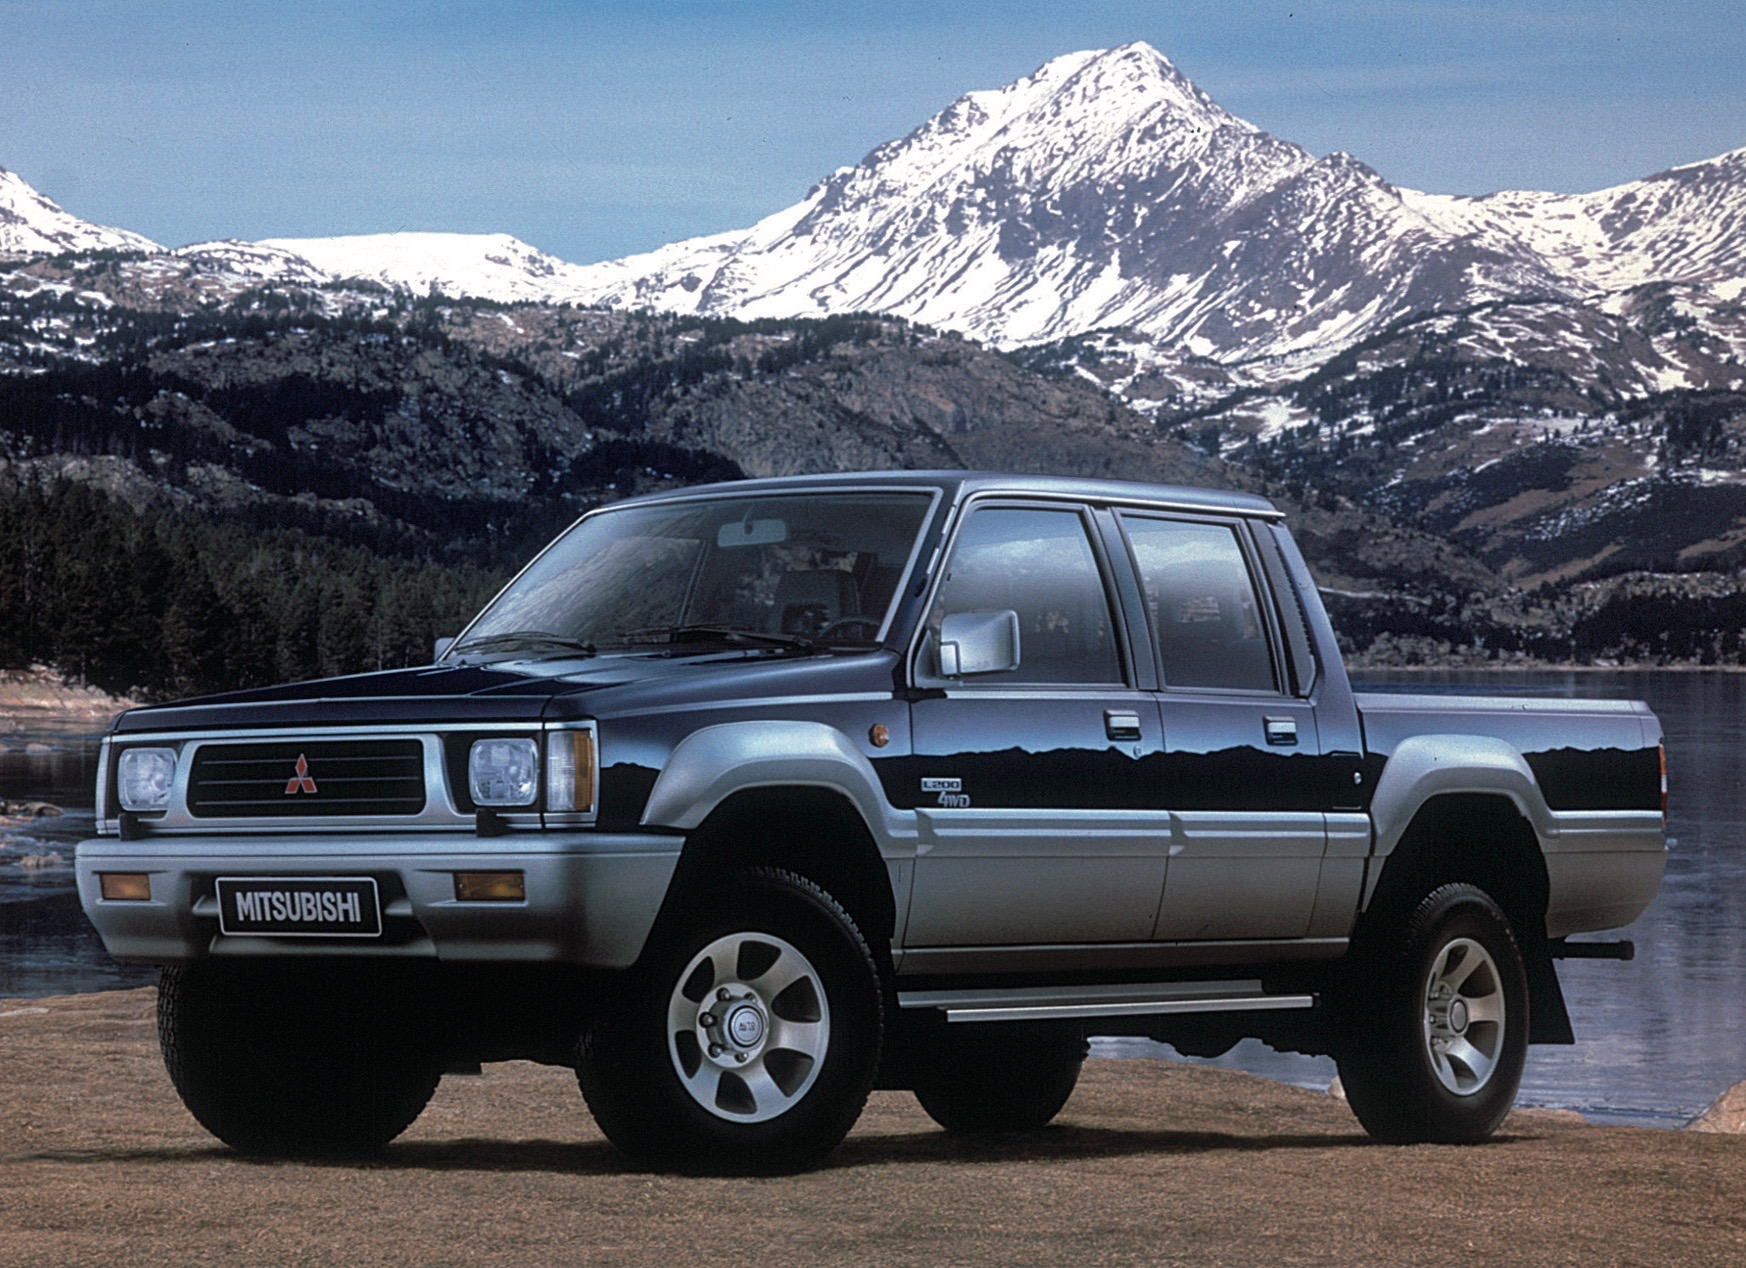 Mitsubishi, Mitsubishi pickup celebrates 40th birthday, ClassicCars.com Journal